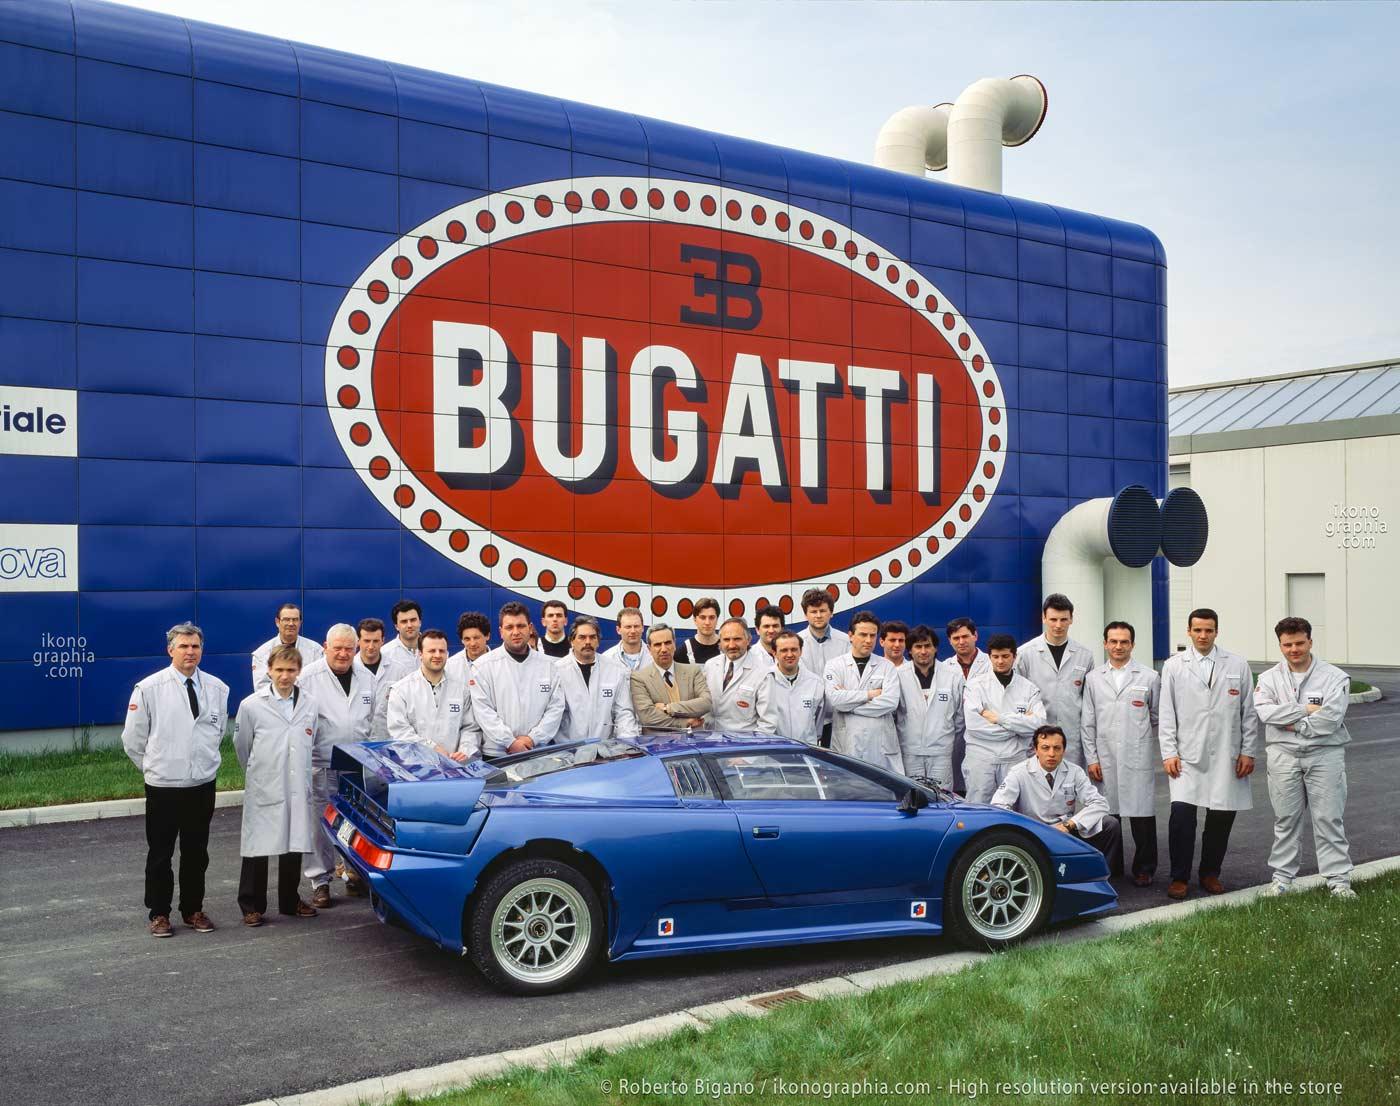 "1936_68 The Bugatti""Reparto Esperienze"", Development Divison employees with the first EB110 Prototype as designed by Marcello Gandini. Photo by Roberto Bigano. Buy this image in the ikonographia.com store."